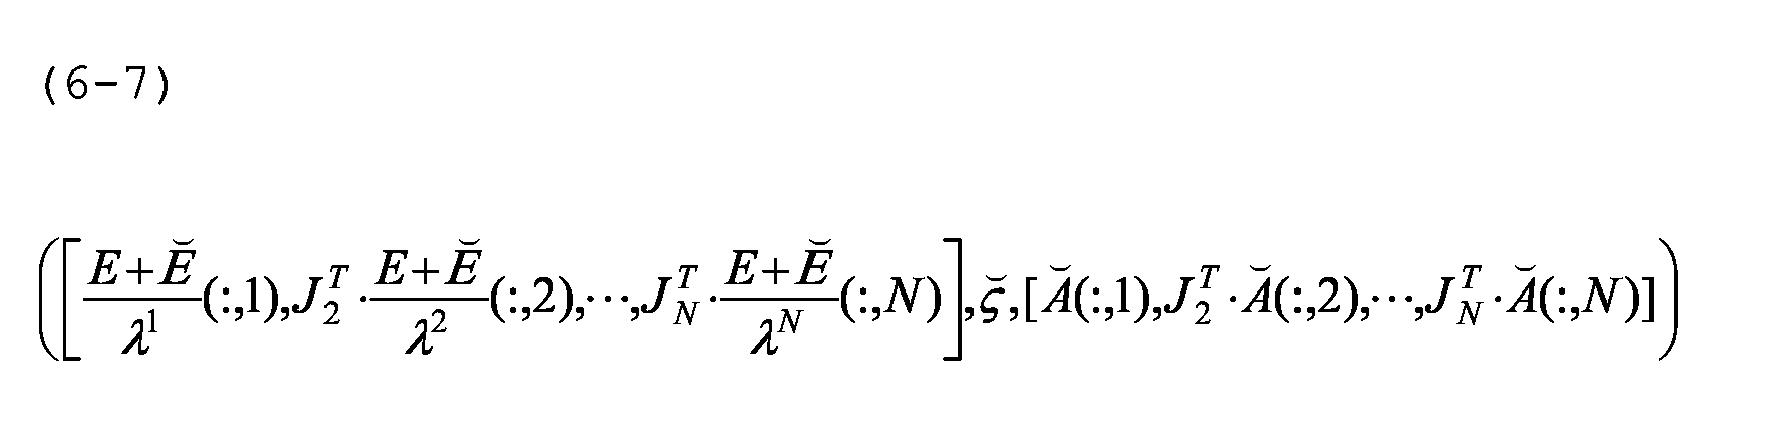 Figure imgb0343